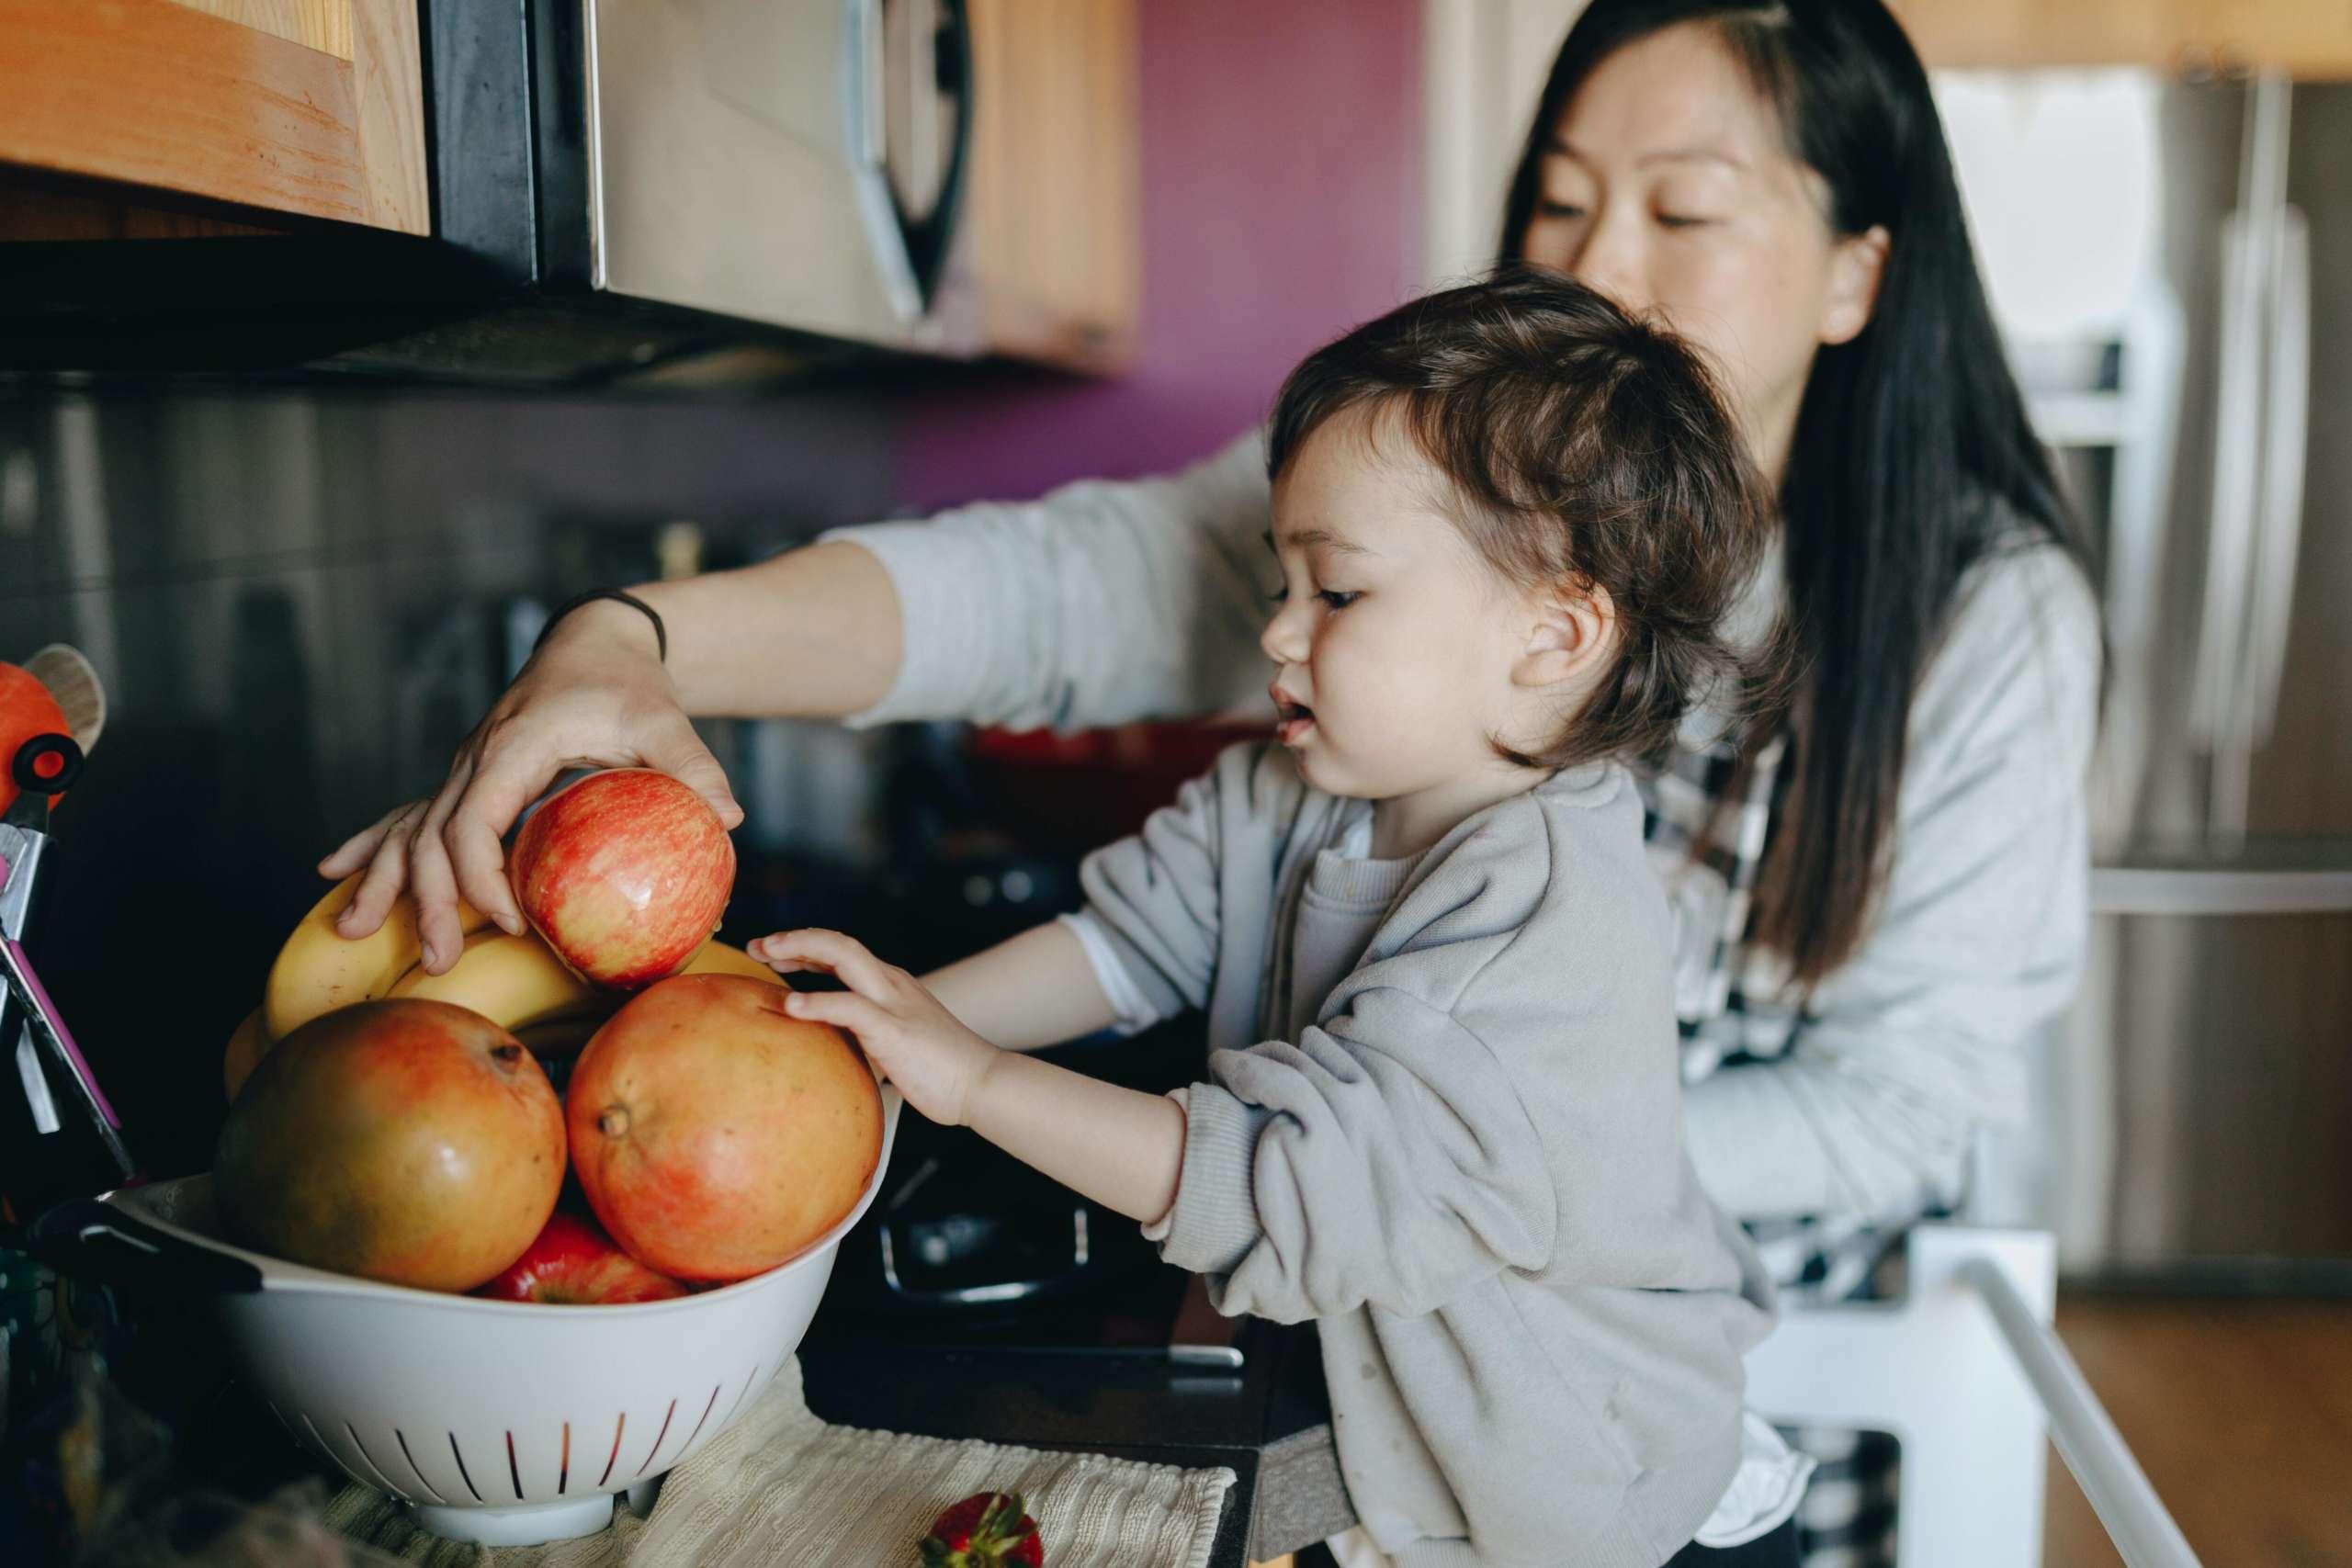 mom-kid-fruits-veggies-fresh